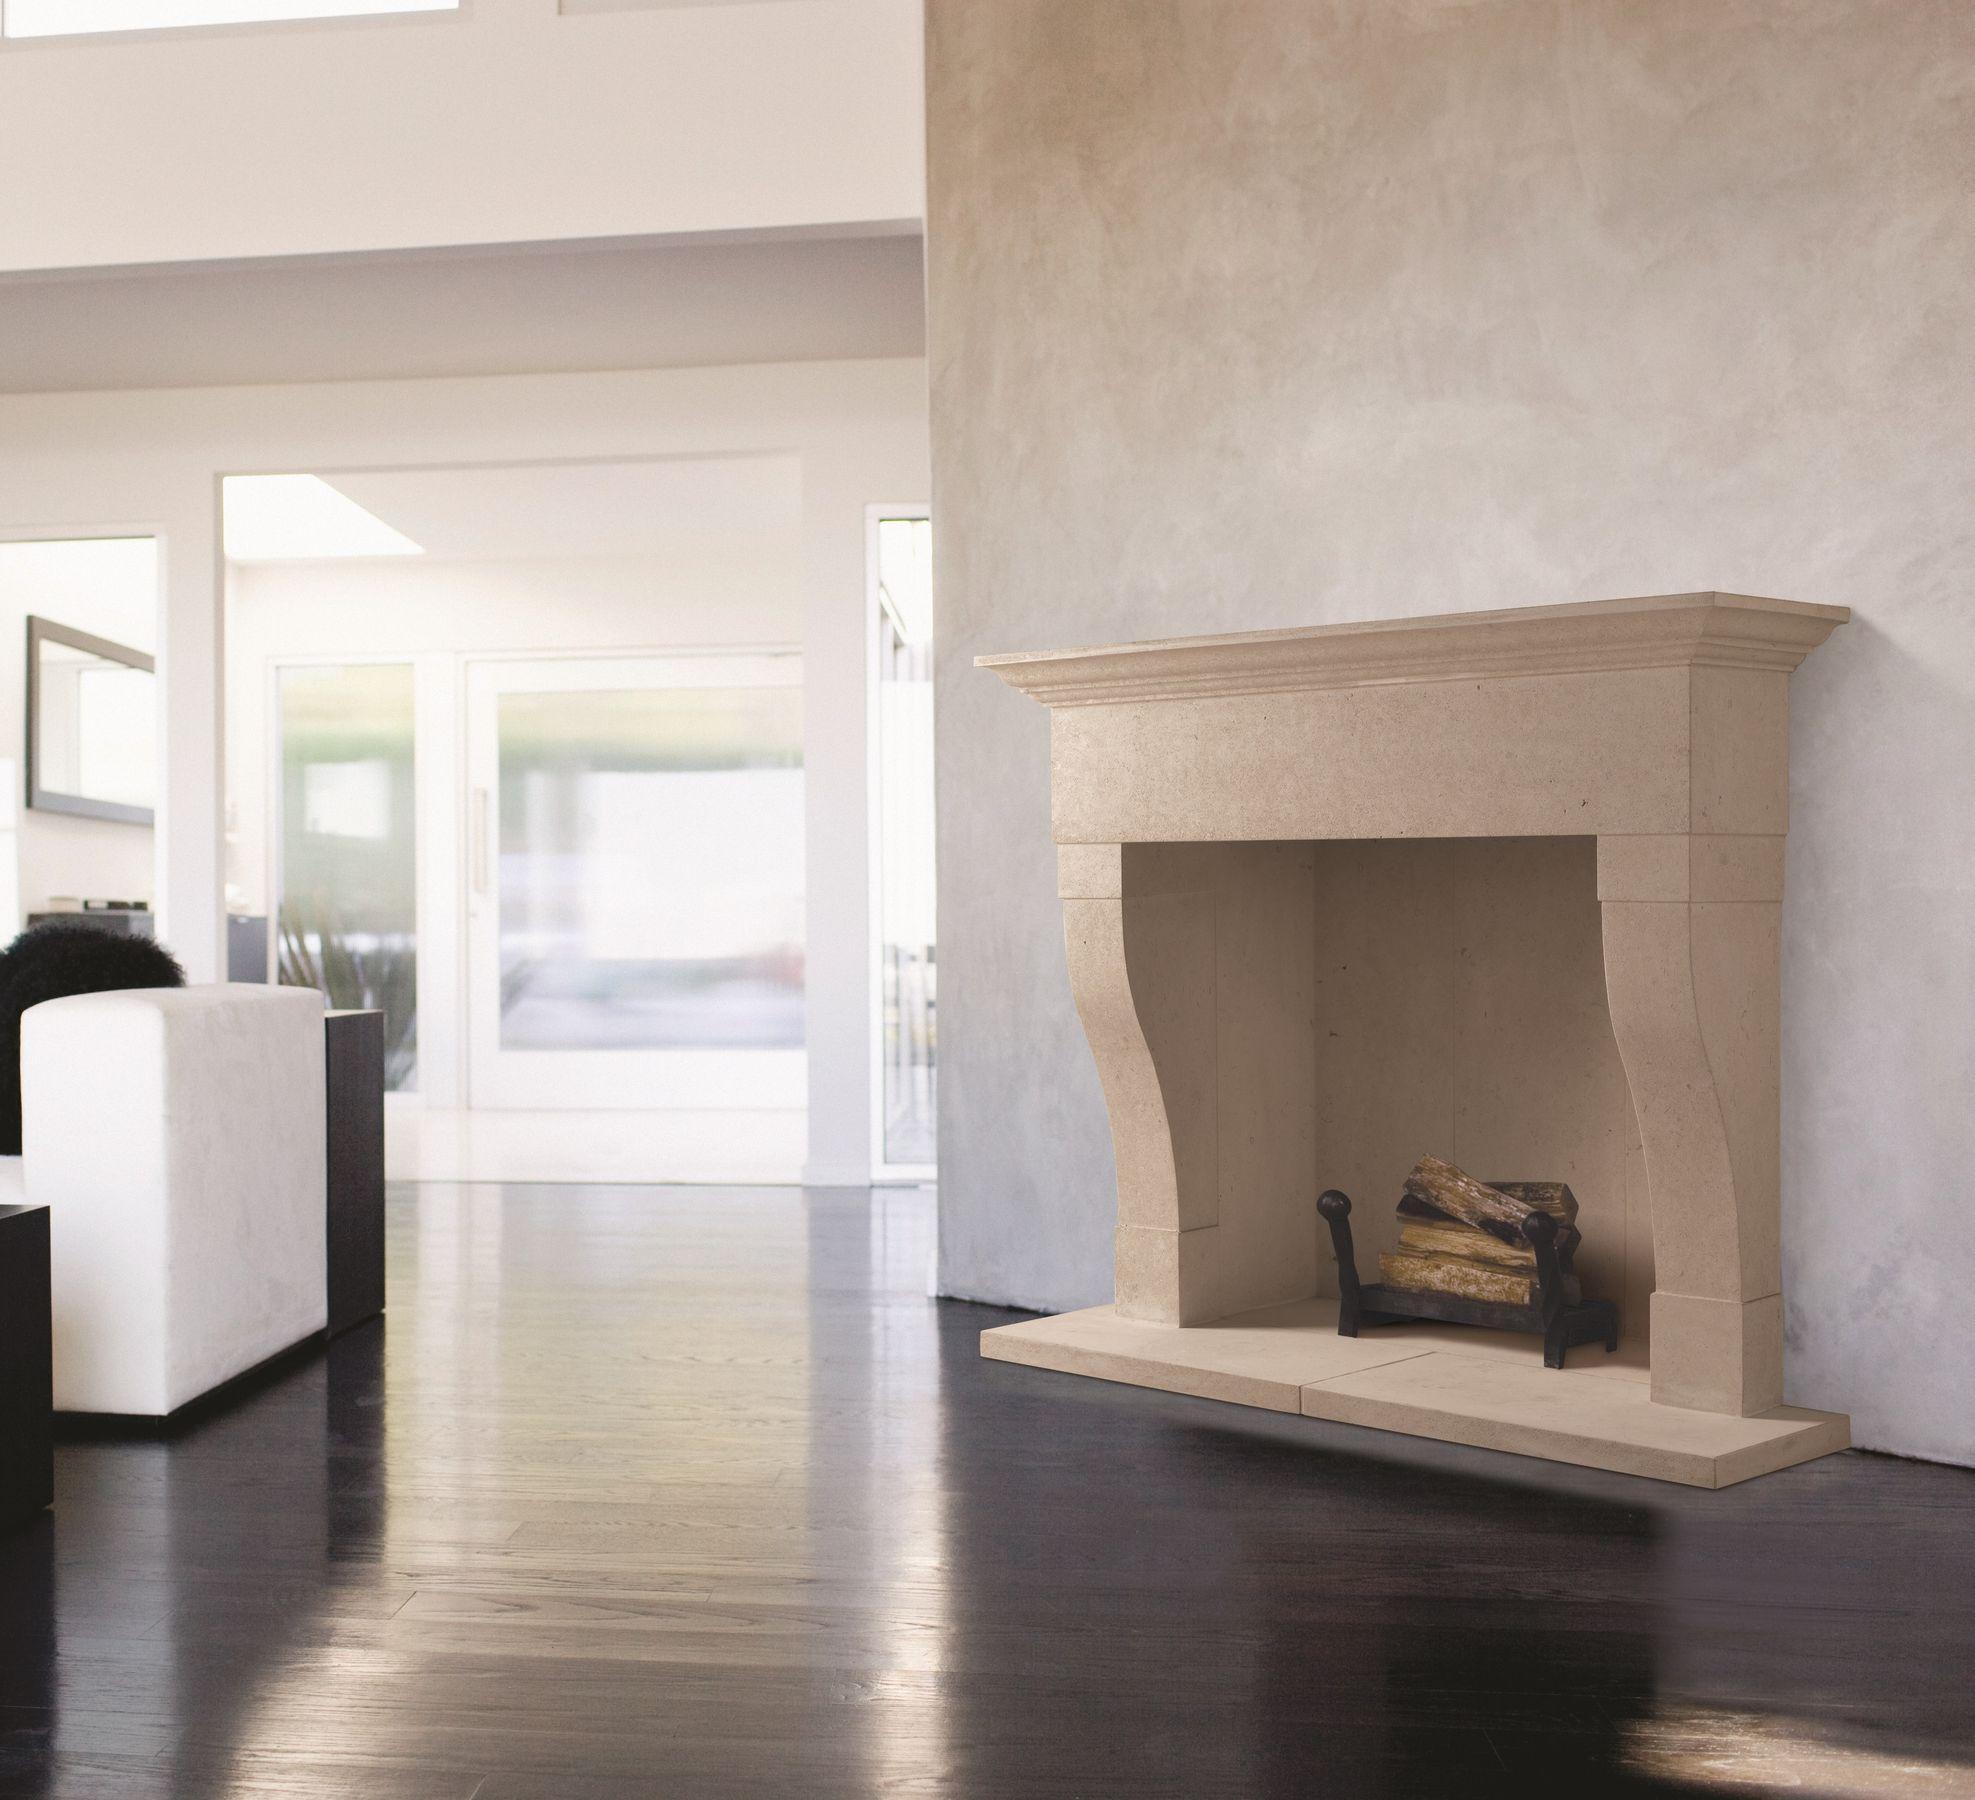 The Chatou Bathtone Fireplace